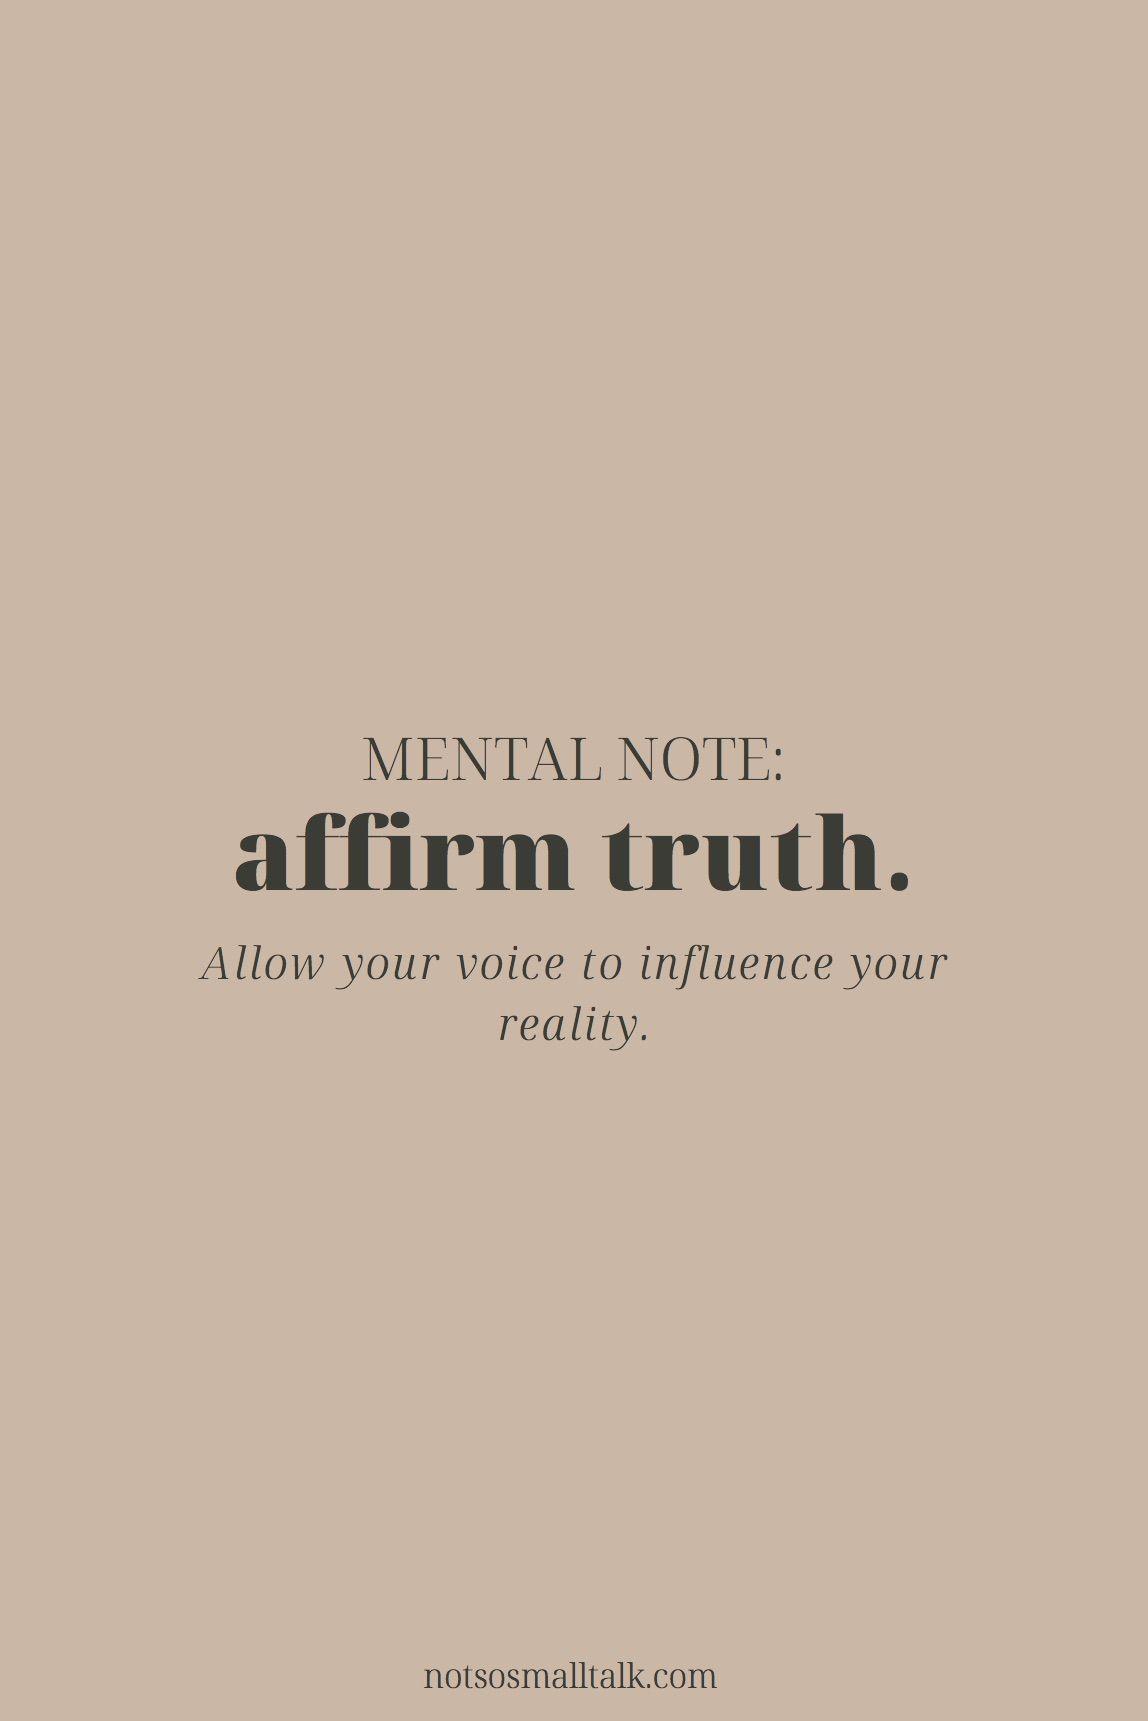 Affirm Truth